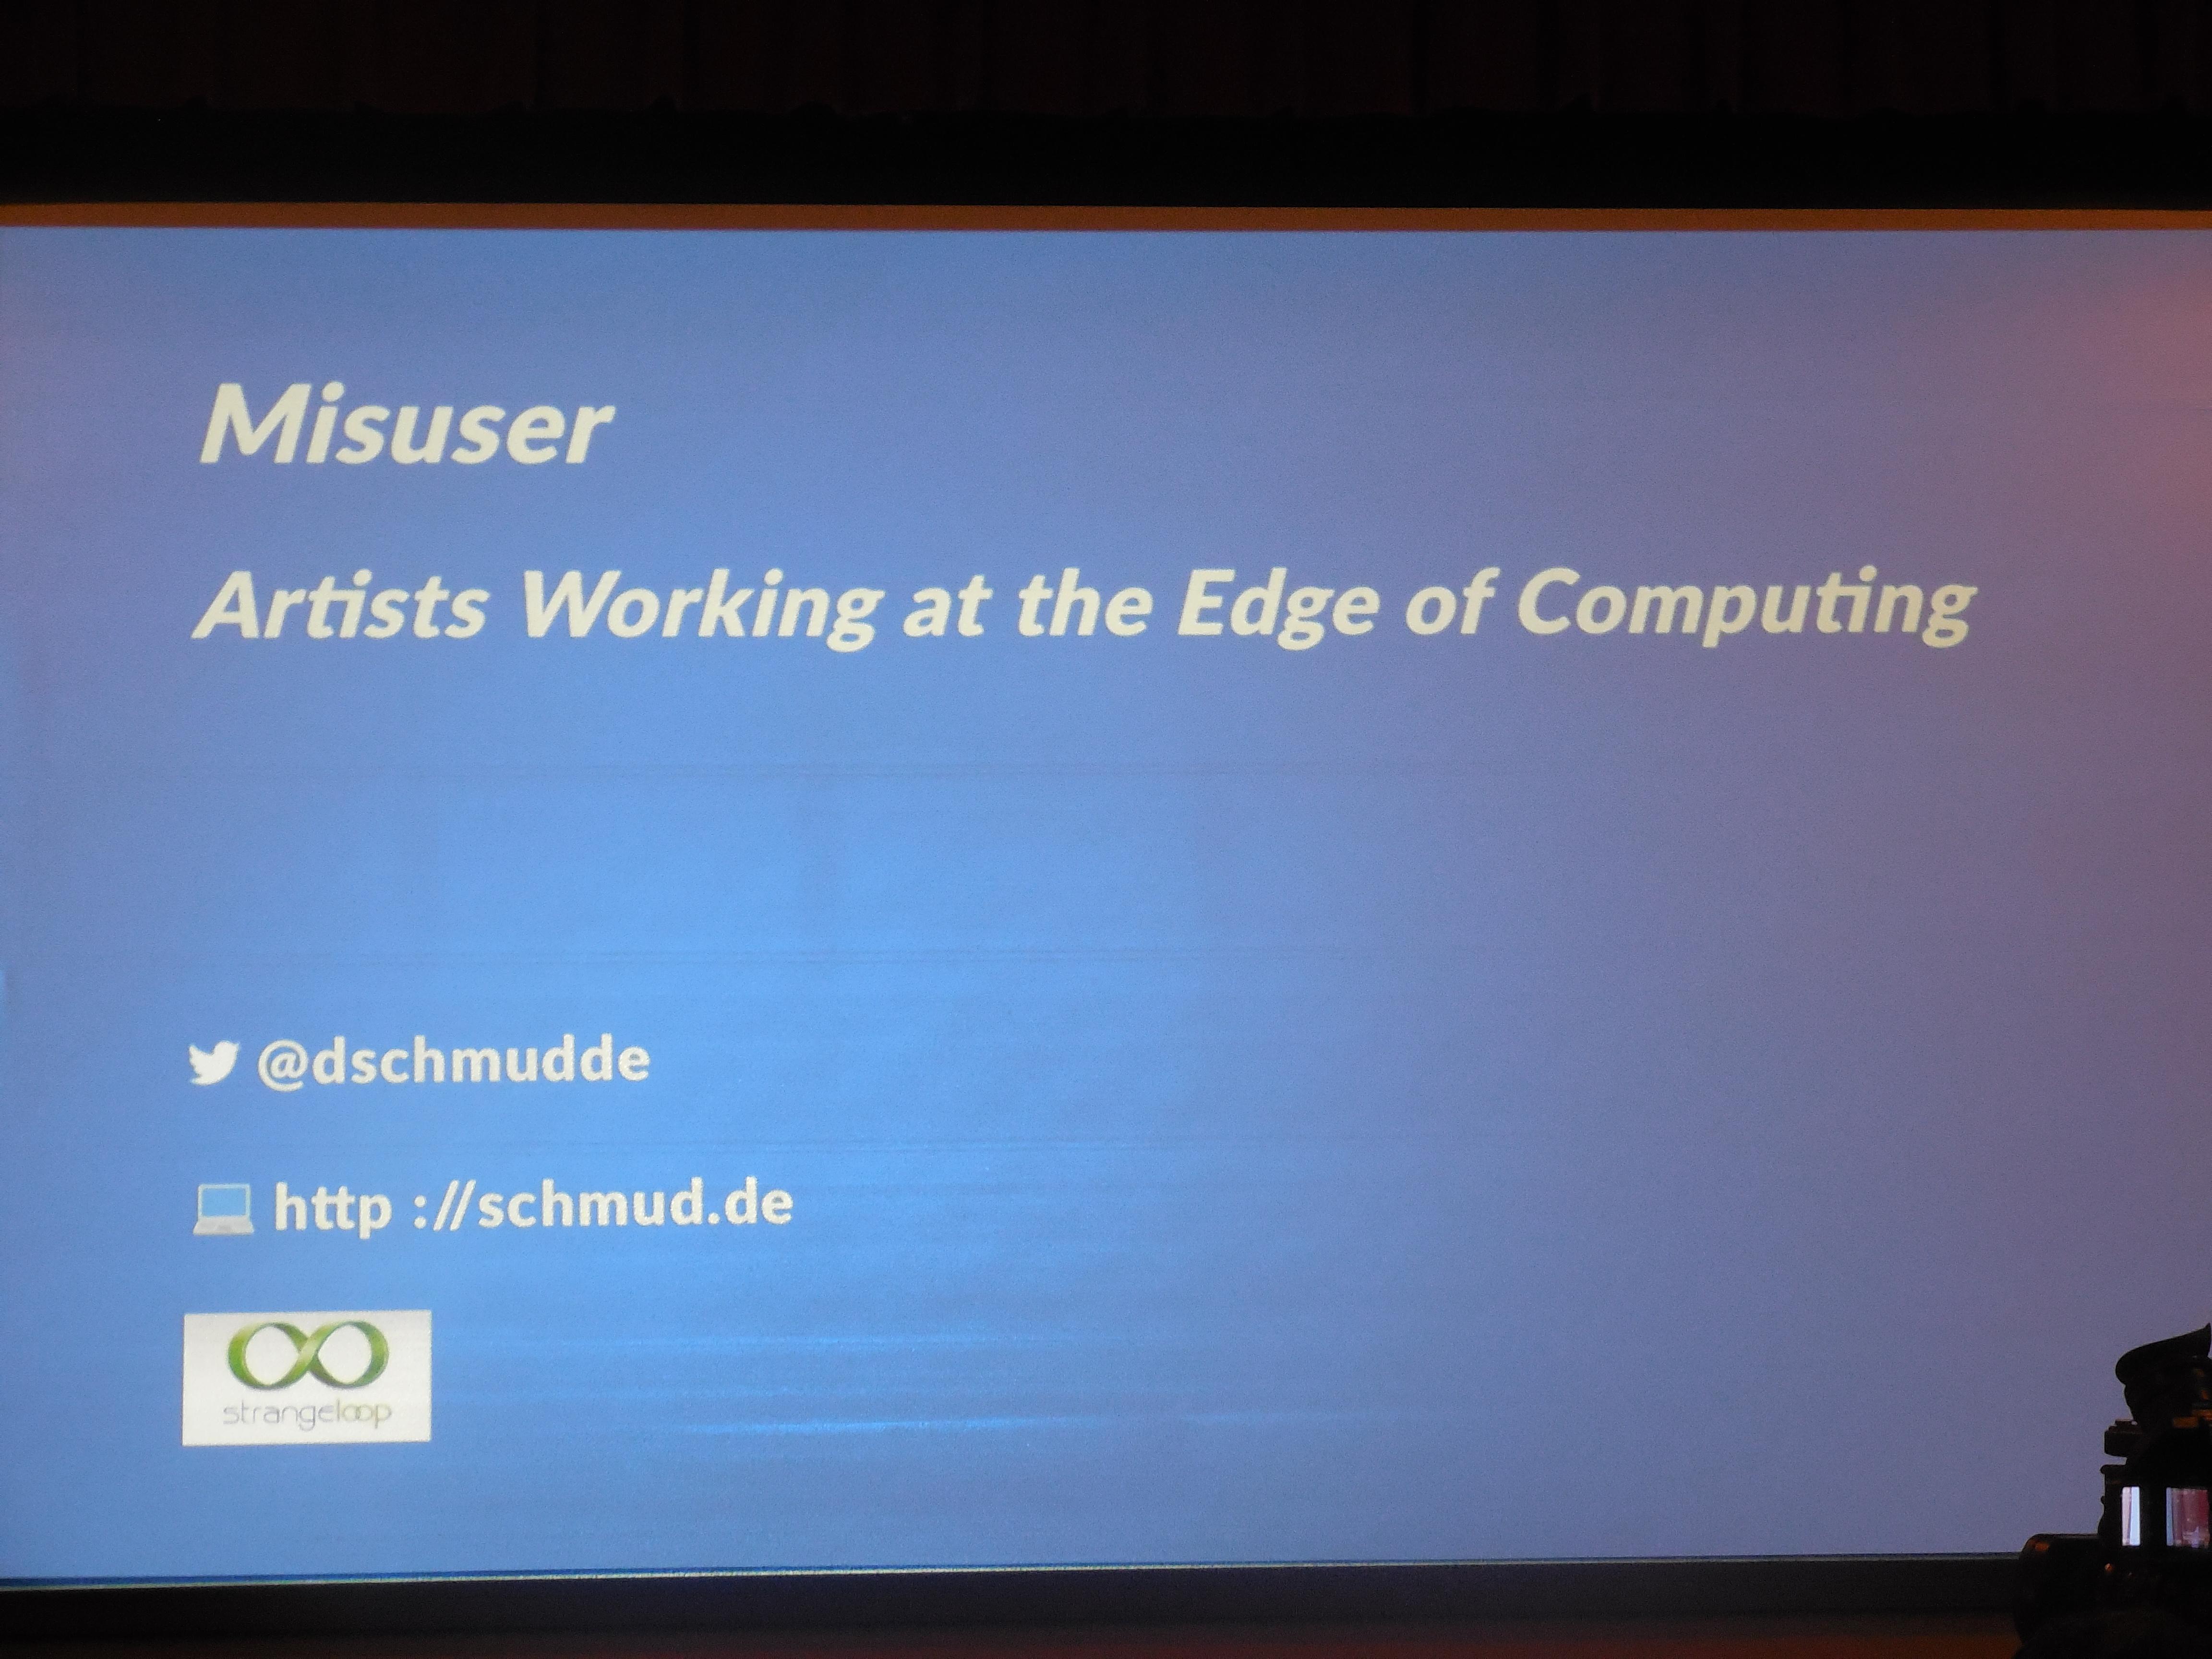 10c88aef6f Strange Loop 3  David Schmüdde and the Art of Misuse